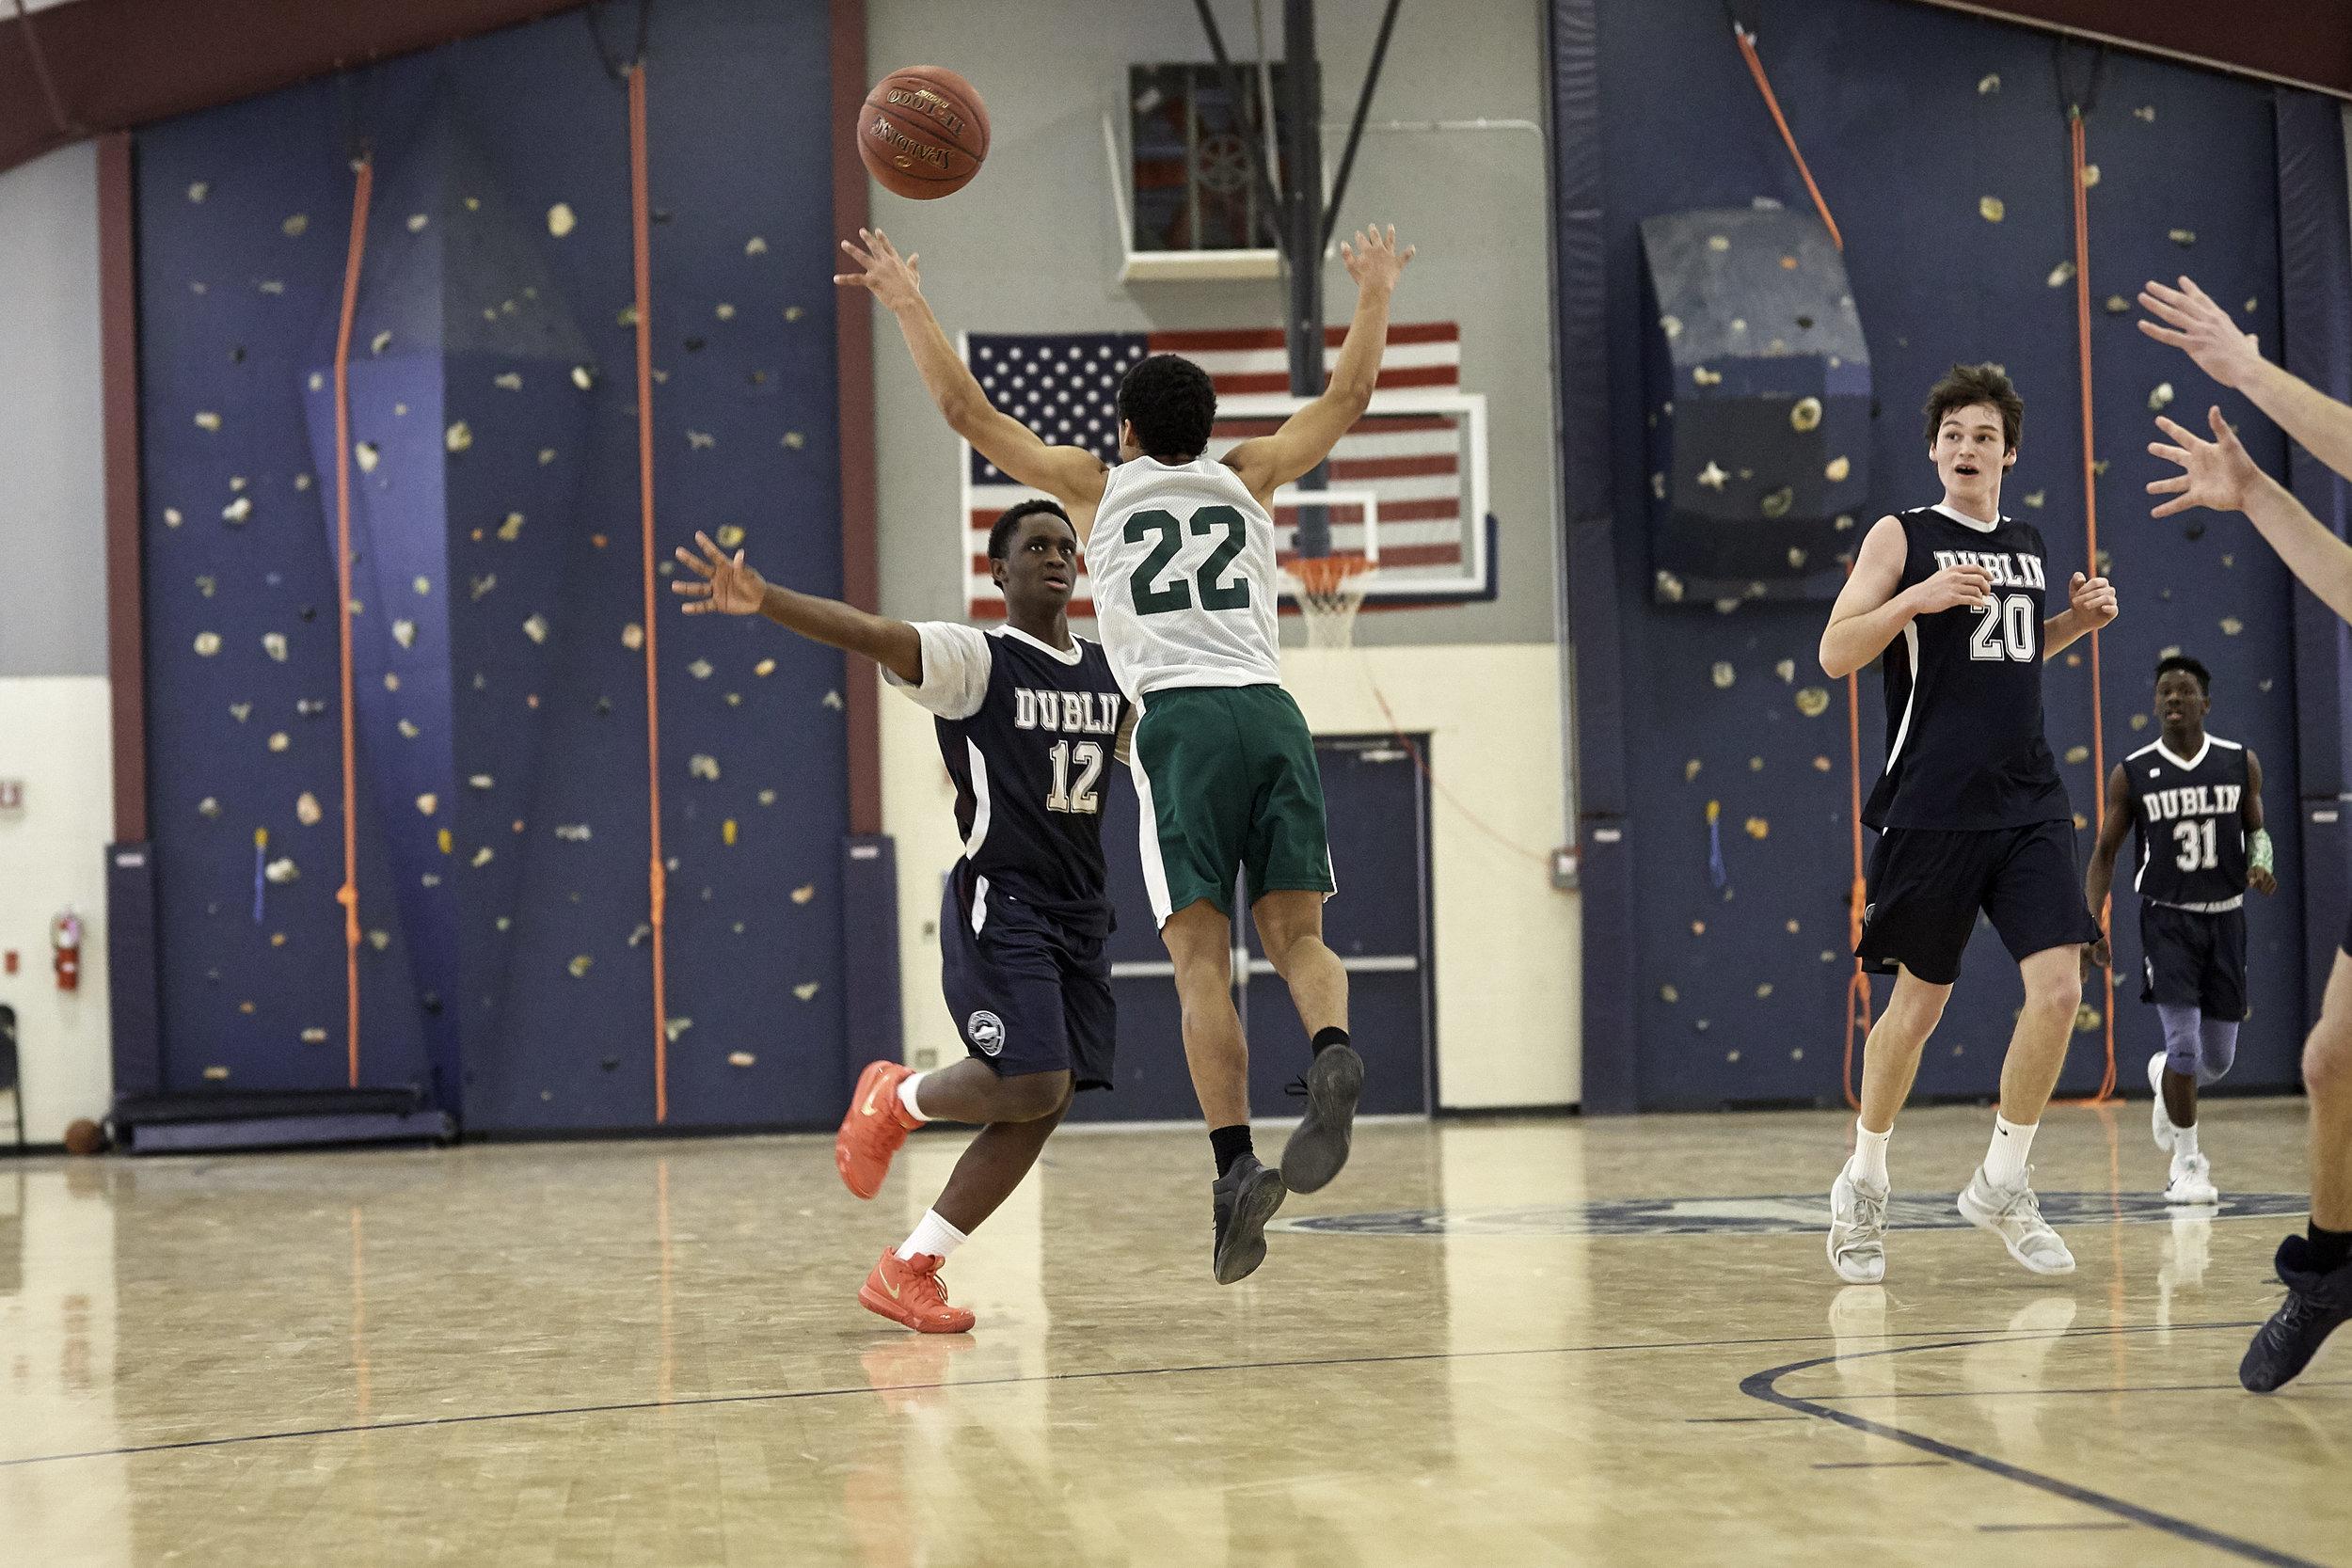 Boys Varsity Basketball vs High Mowing School - Feb 02 2019 - 0034.jpg